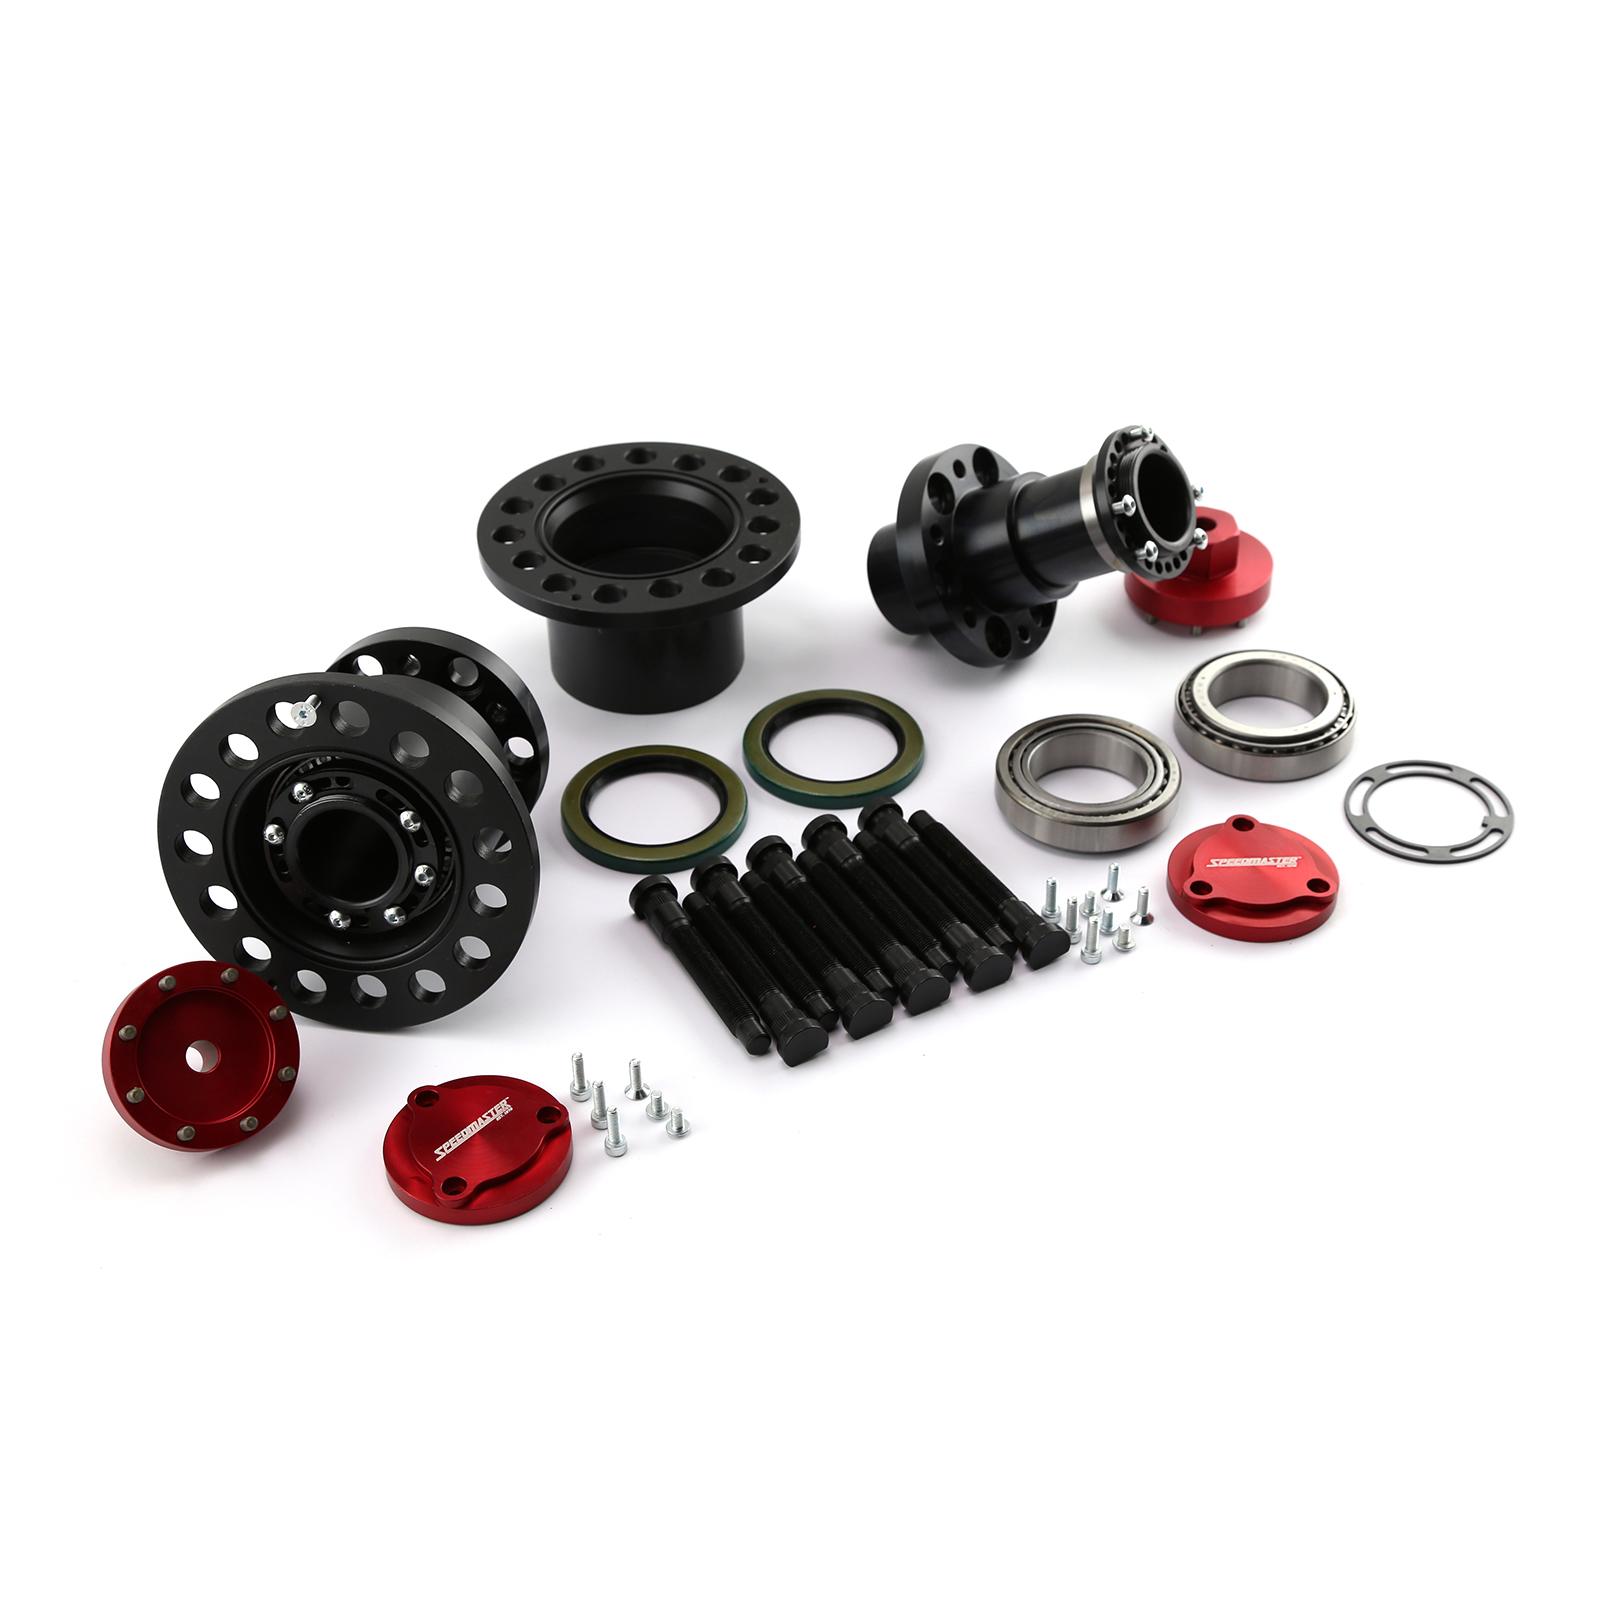 "Speedmaster® PCE572.1004 Ford 9"" Complete Weld on Floater Kit Assembly for 3"" Tube"